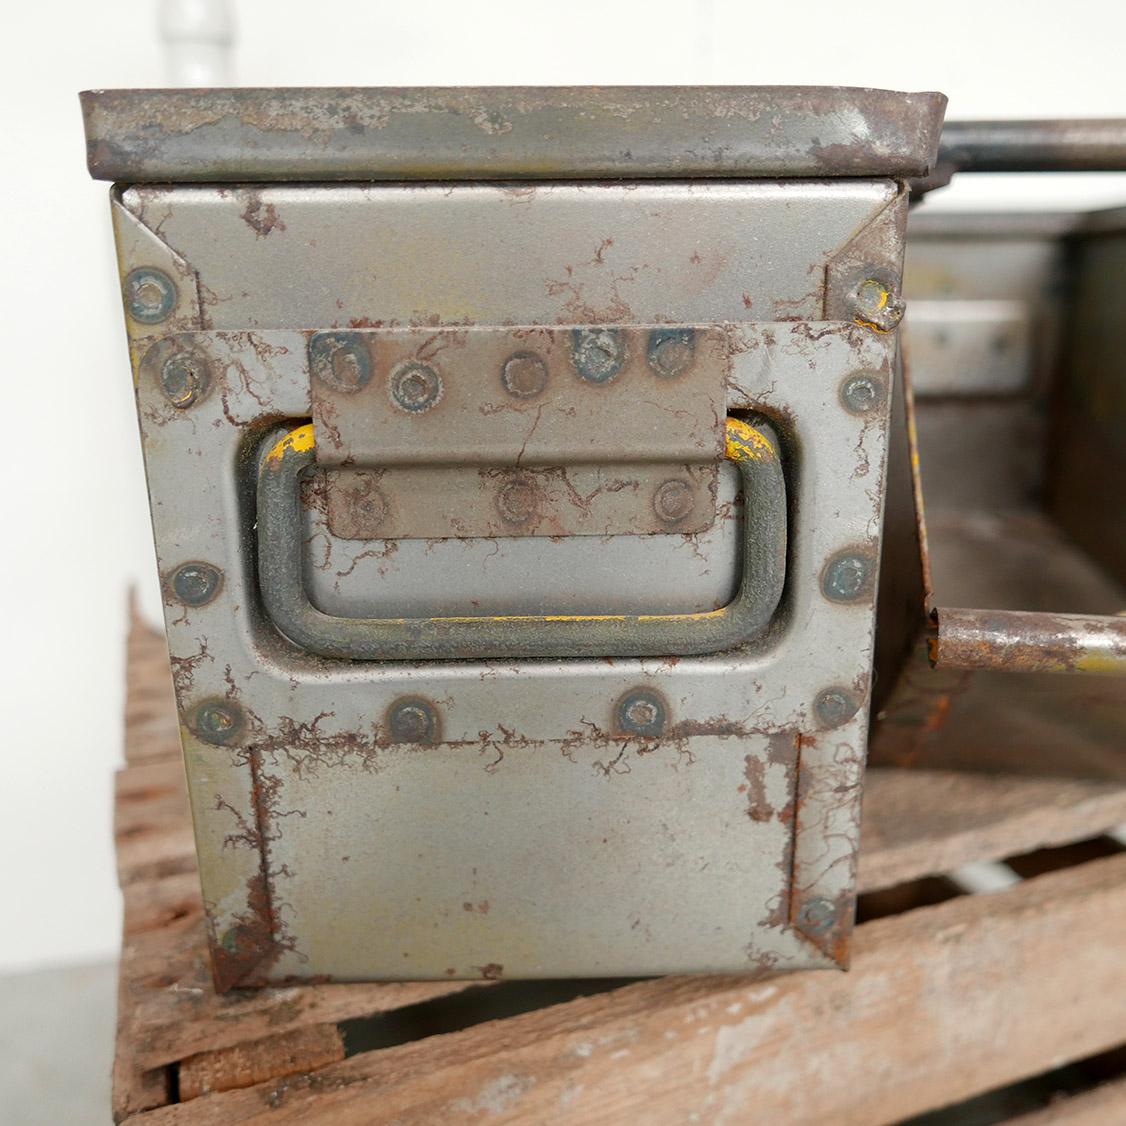 casier industriel en m tal vintage objet de m tier rangements. Black Bedroom Furniture Sets. Home Design Ideas